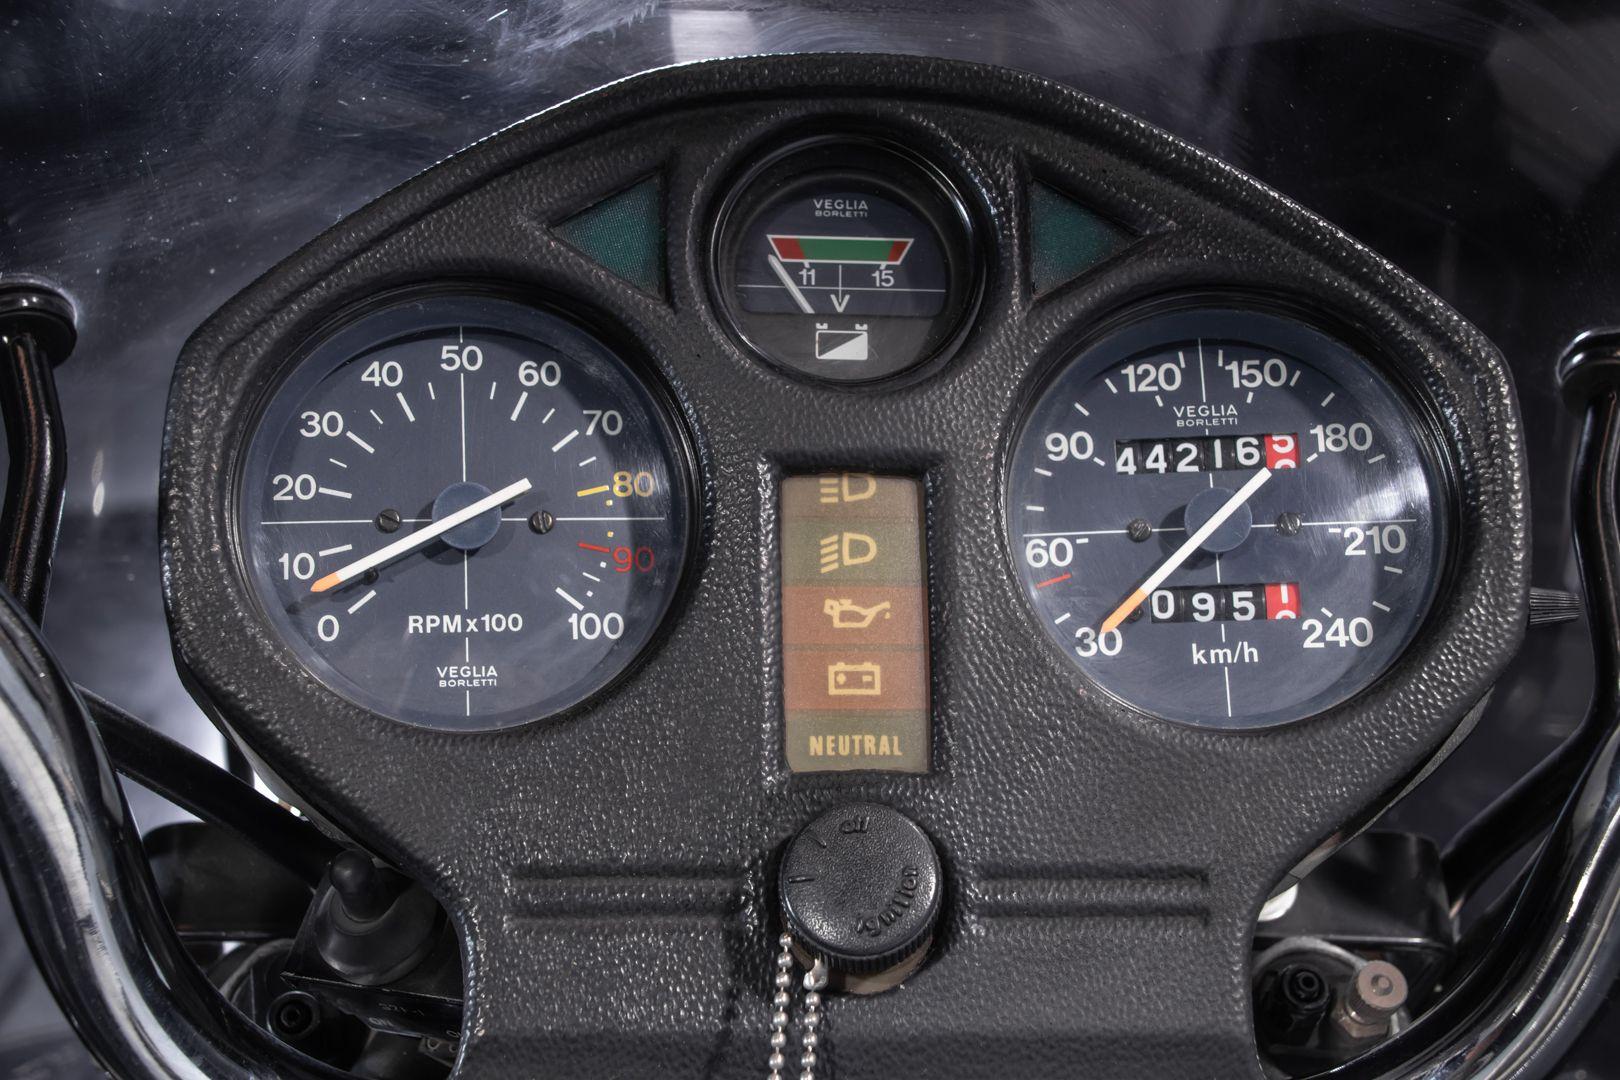 1983 Moto Guzzi California 78929